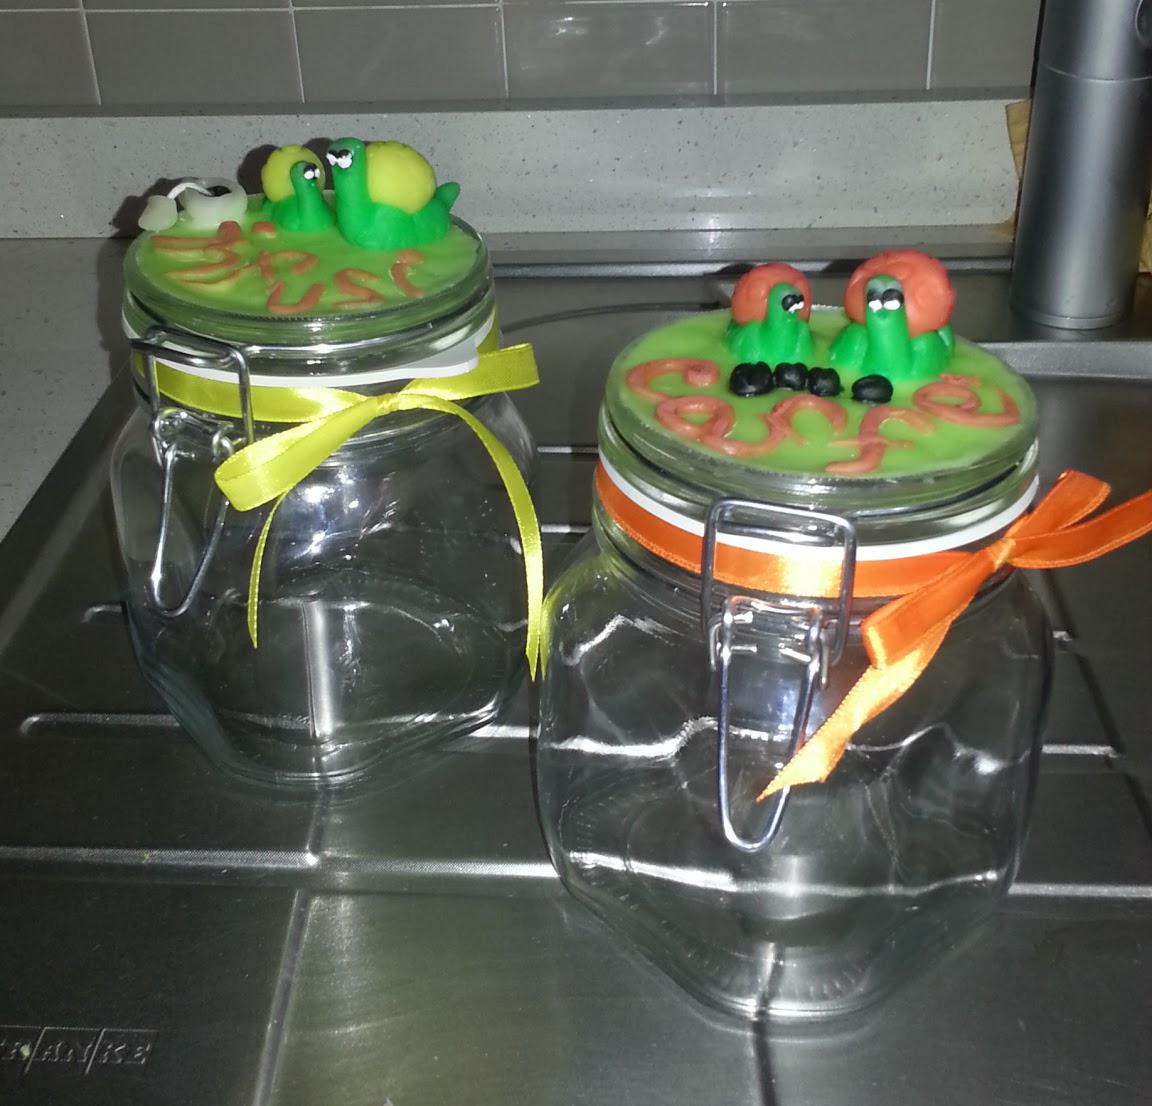 Officinadelbosco barattoli da cucina - Barattoli cucina colorati ...